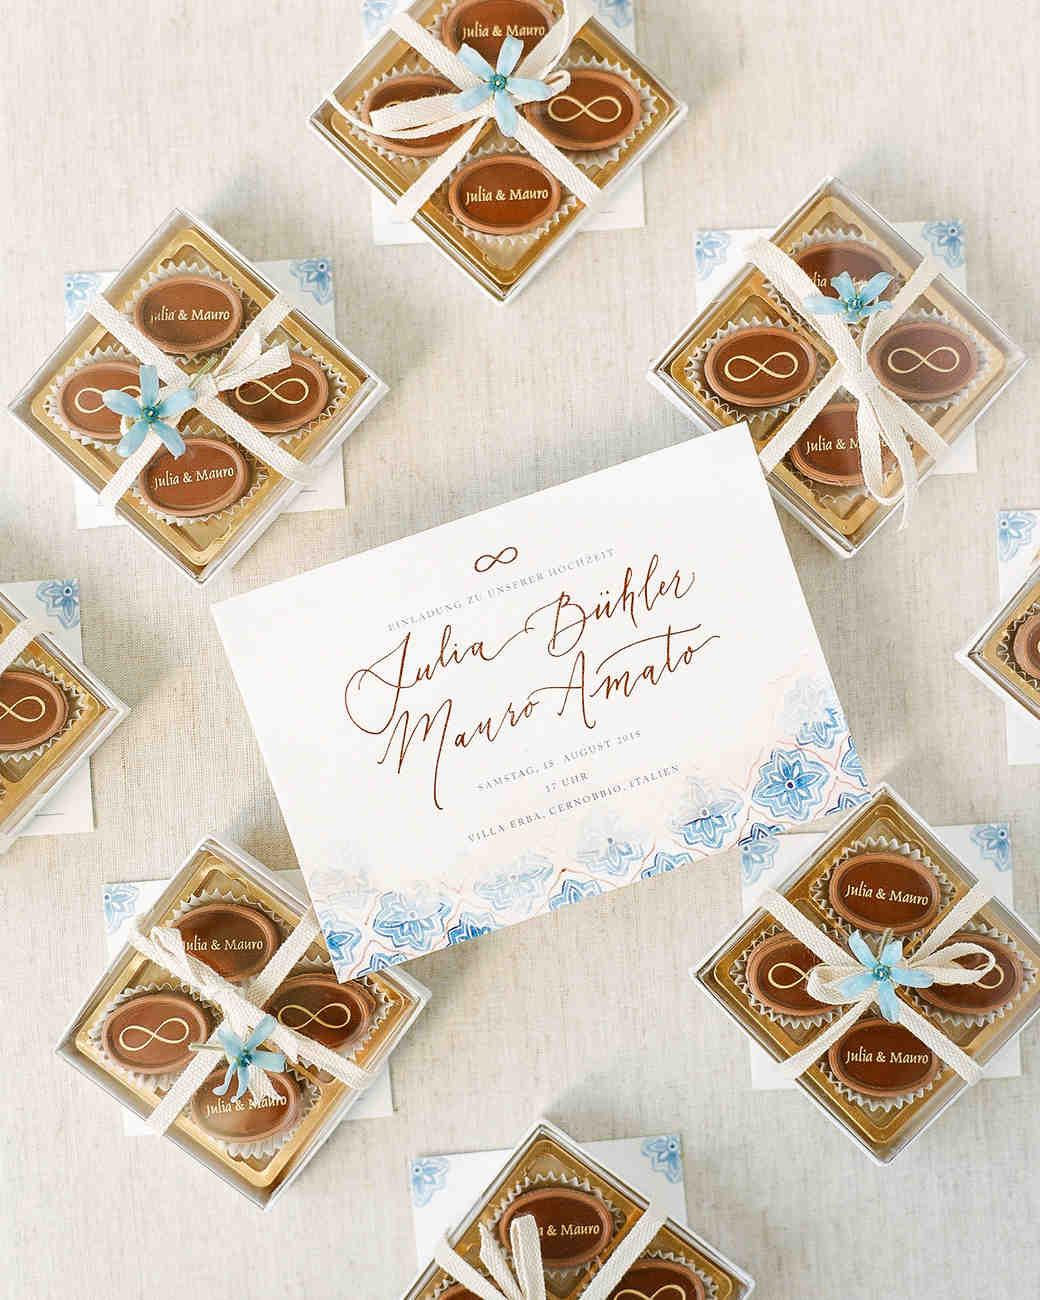 julia mauro wedding favors and invitation